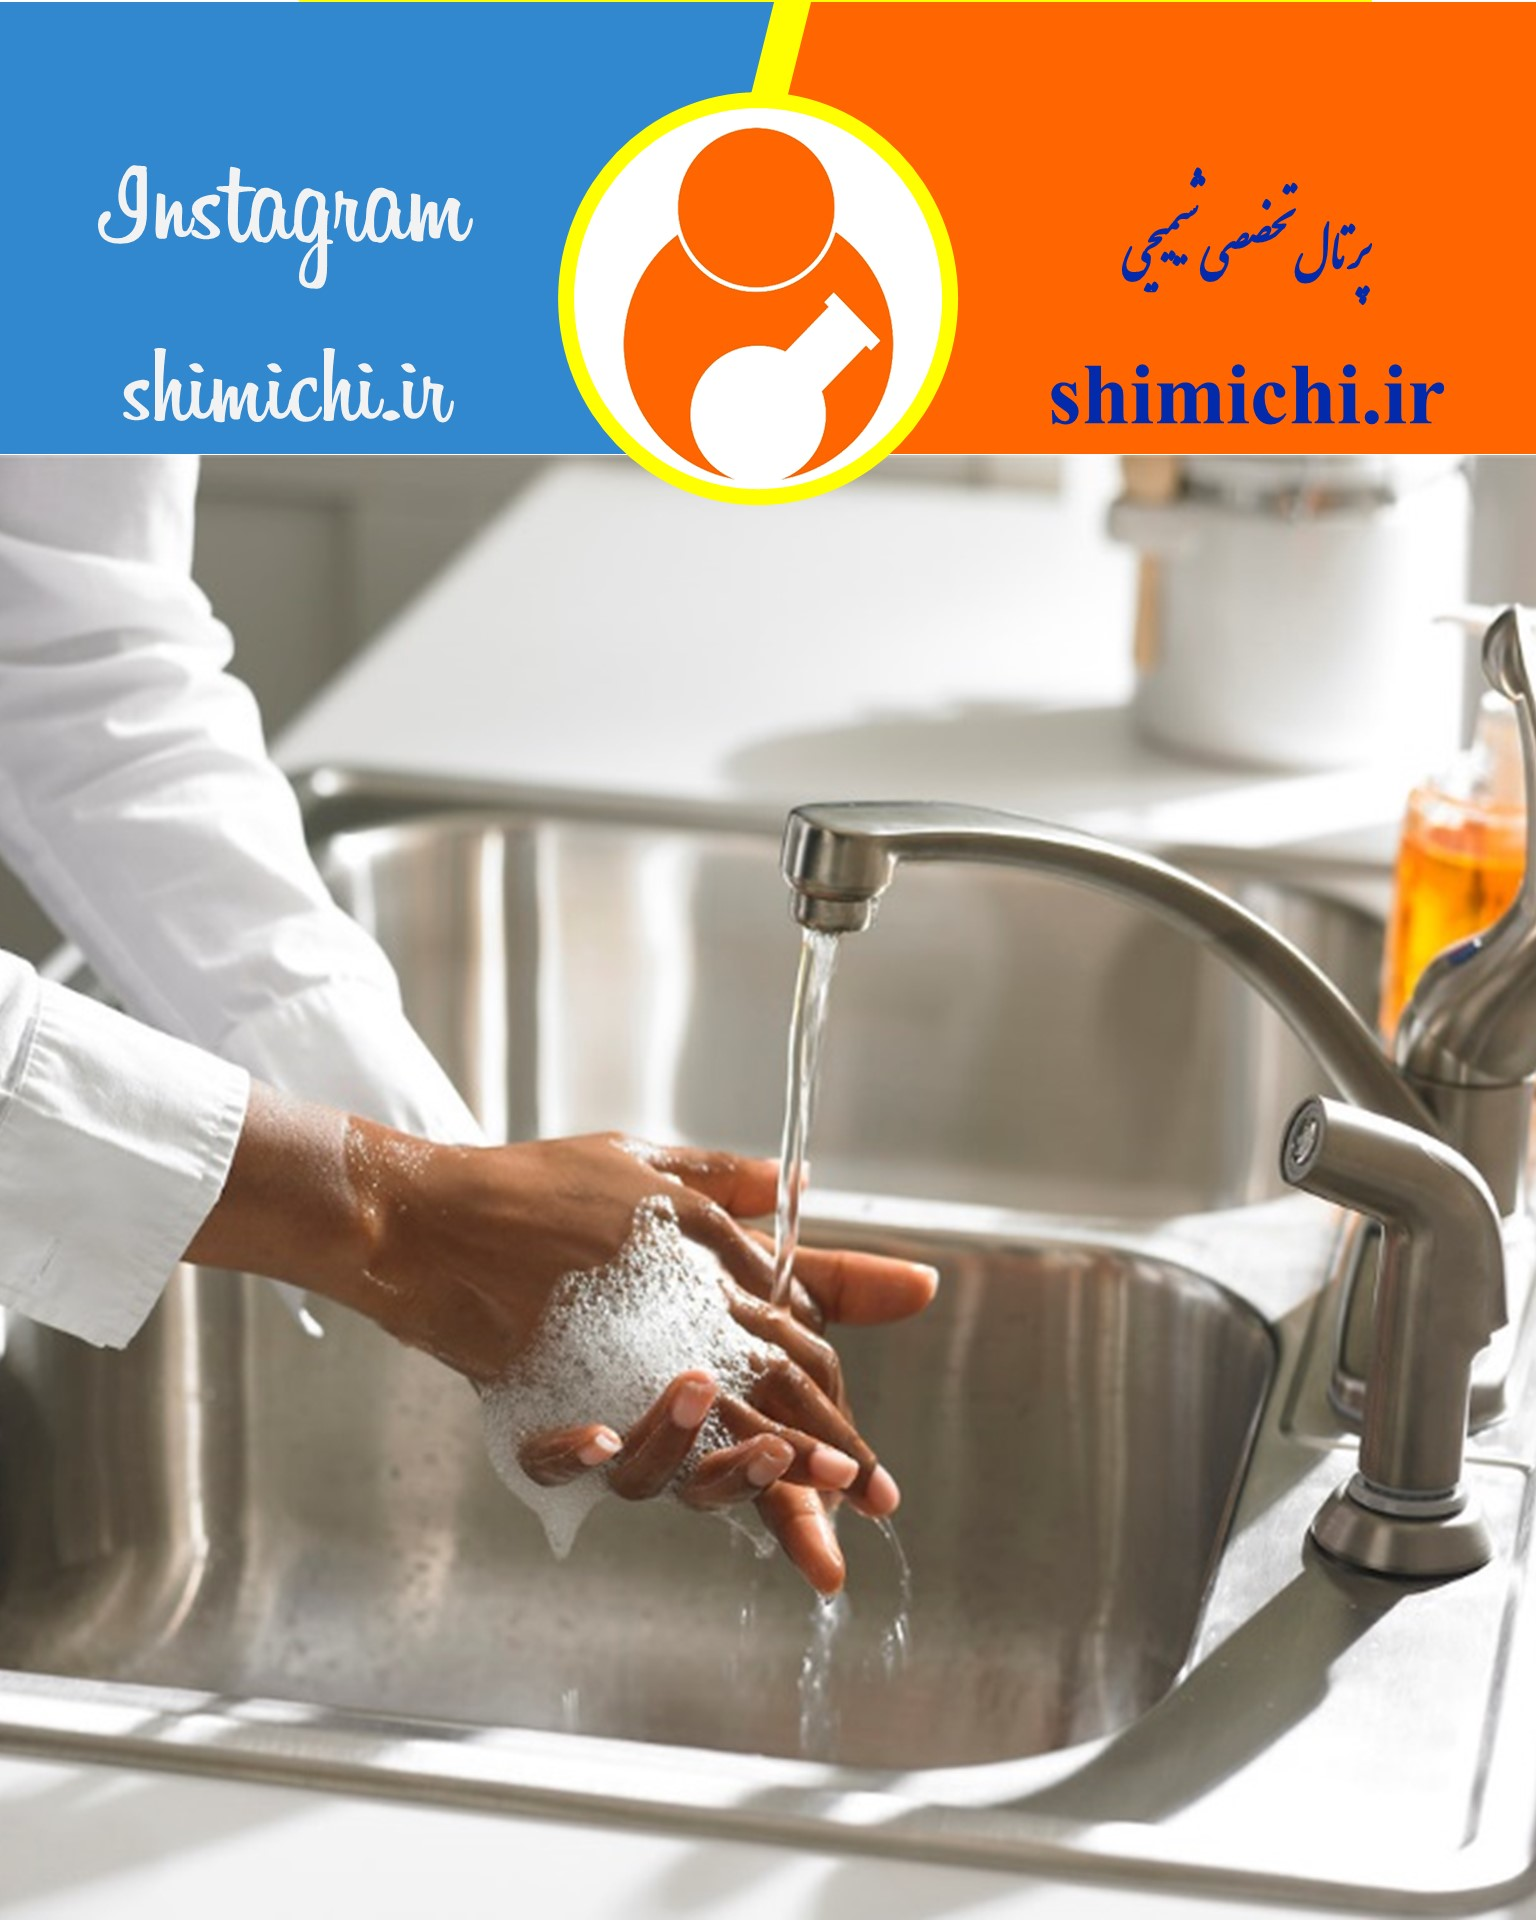 shimichi-types-of-detergents صفحه اصلی